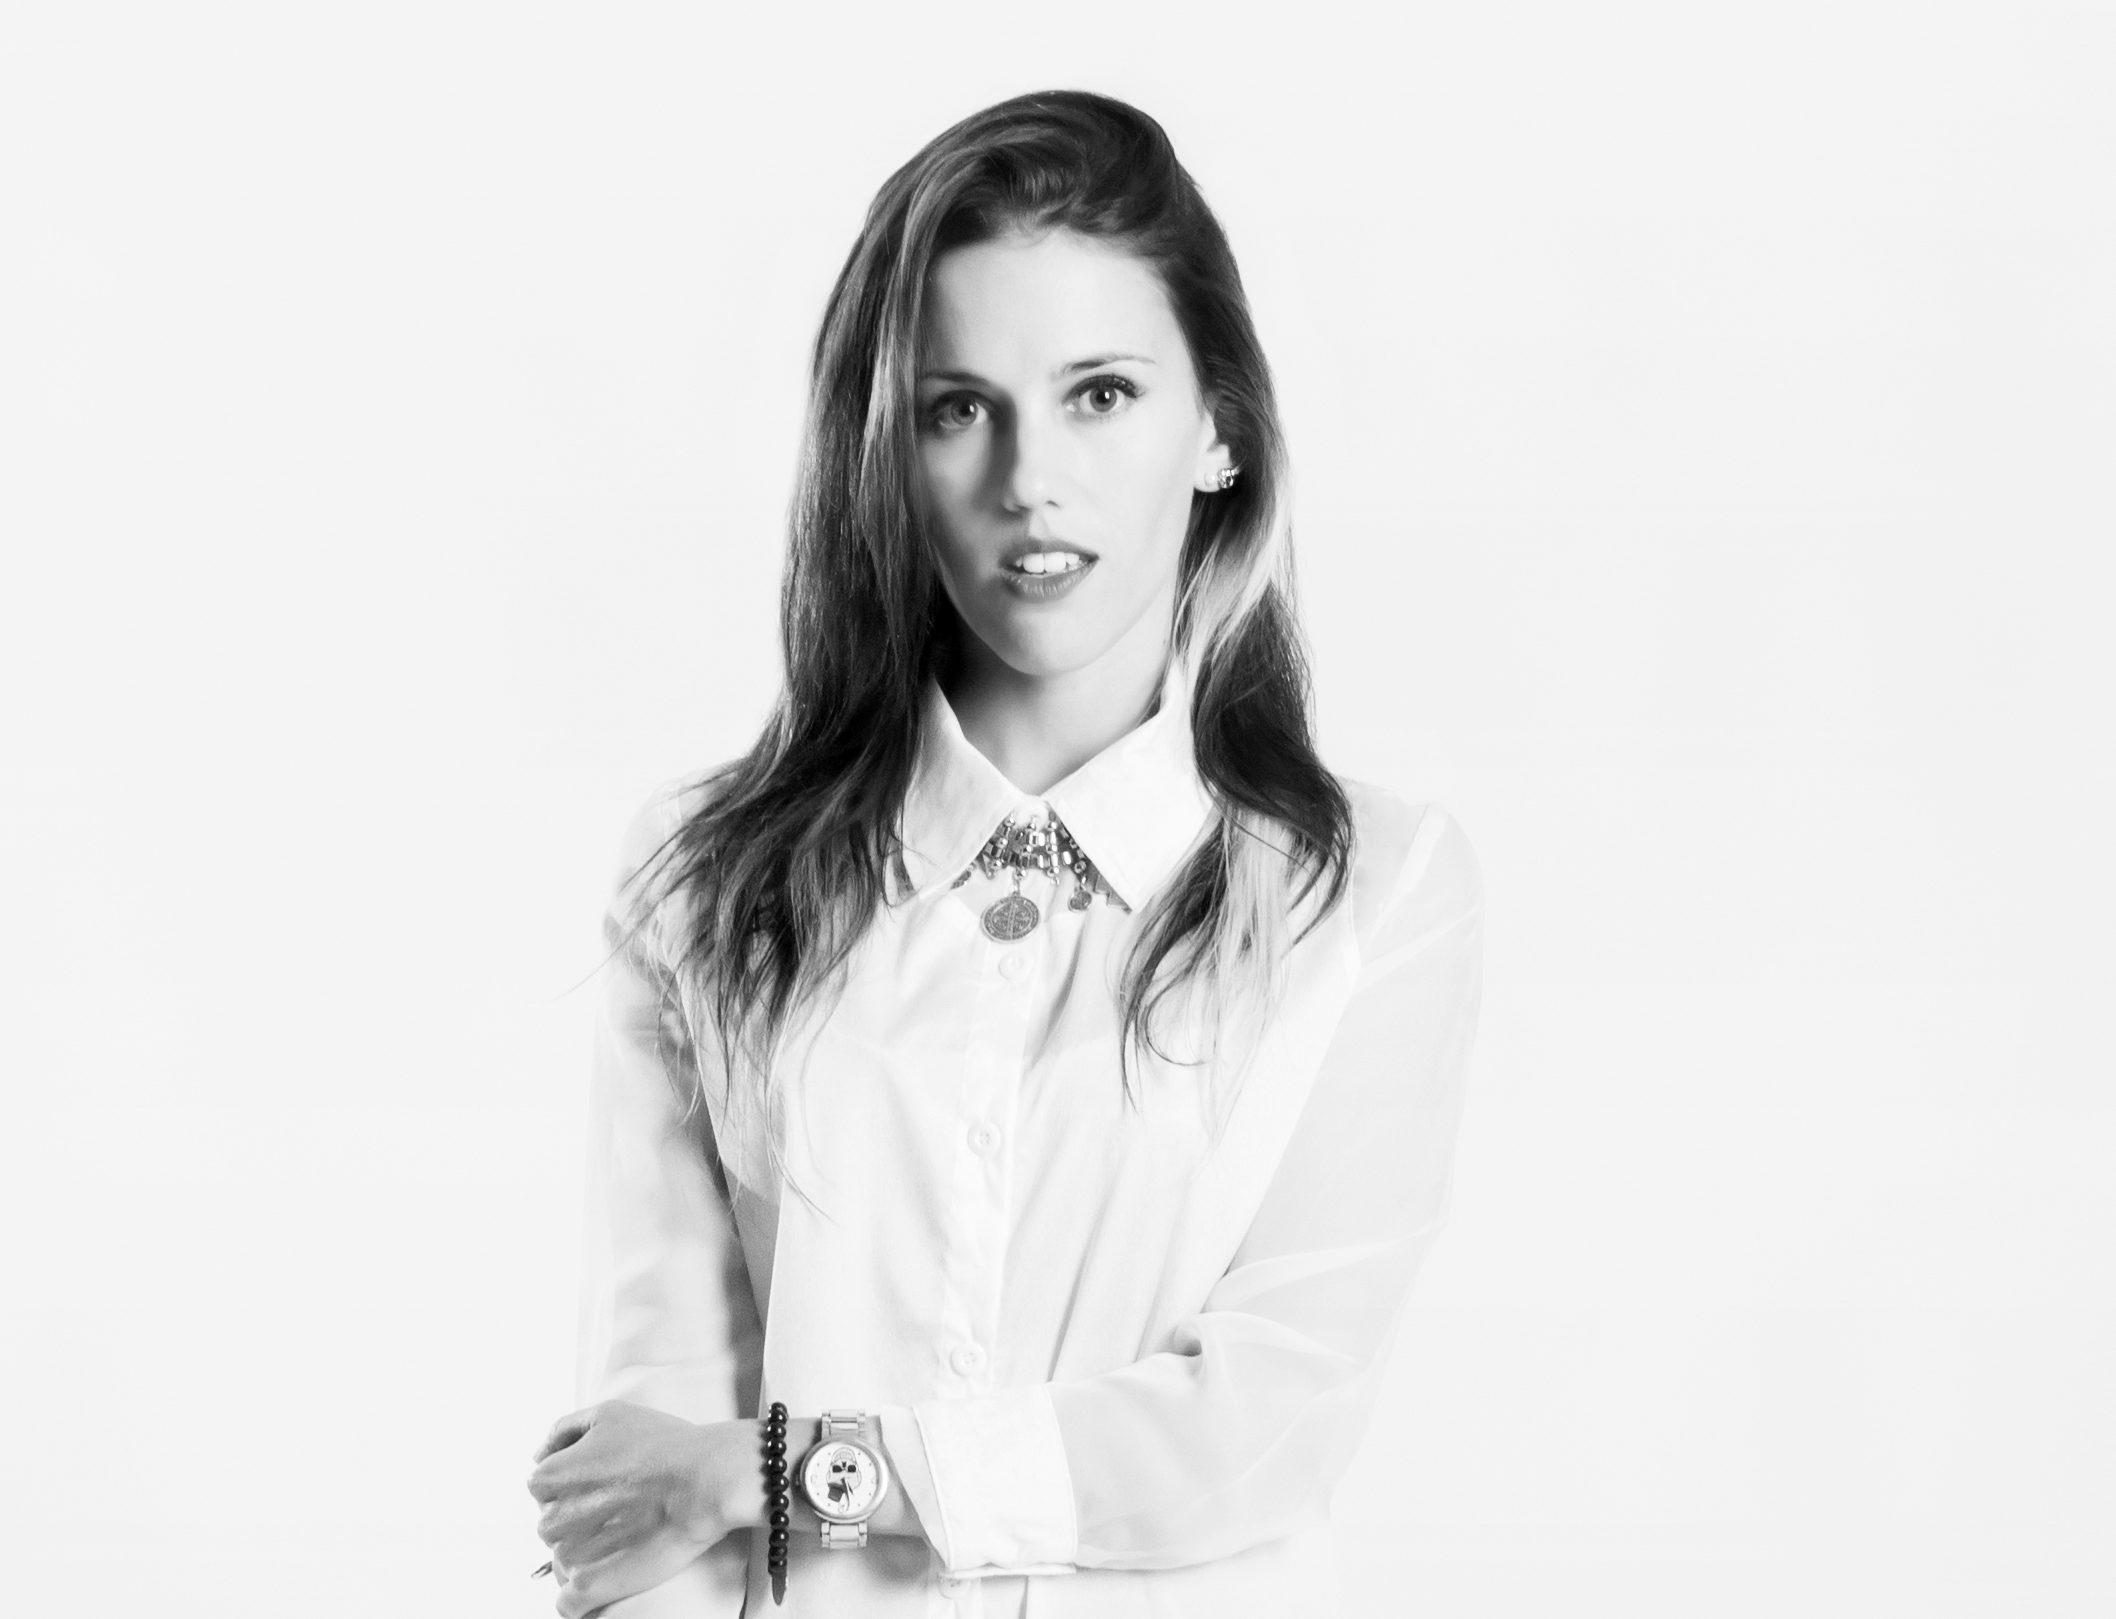 Lucía Ocampo